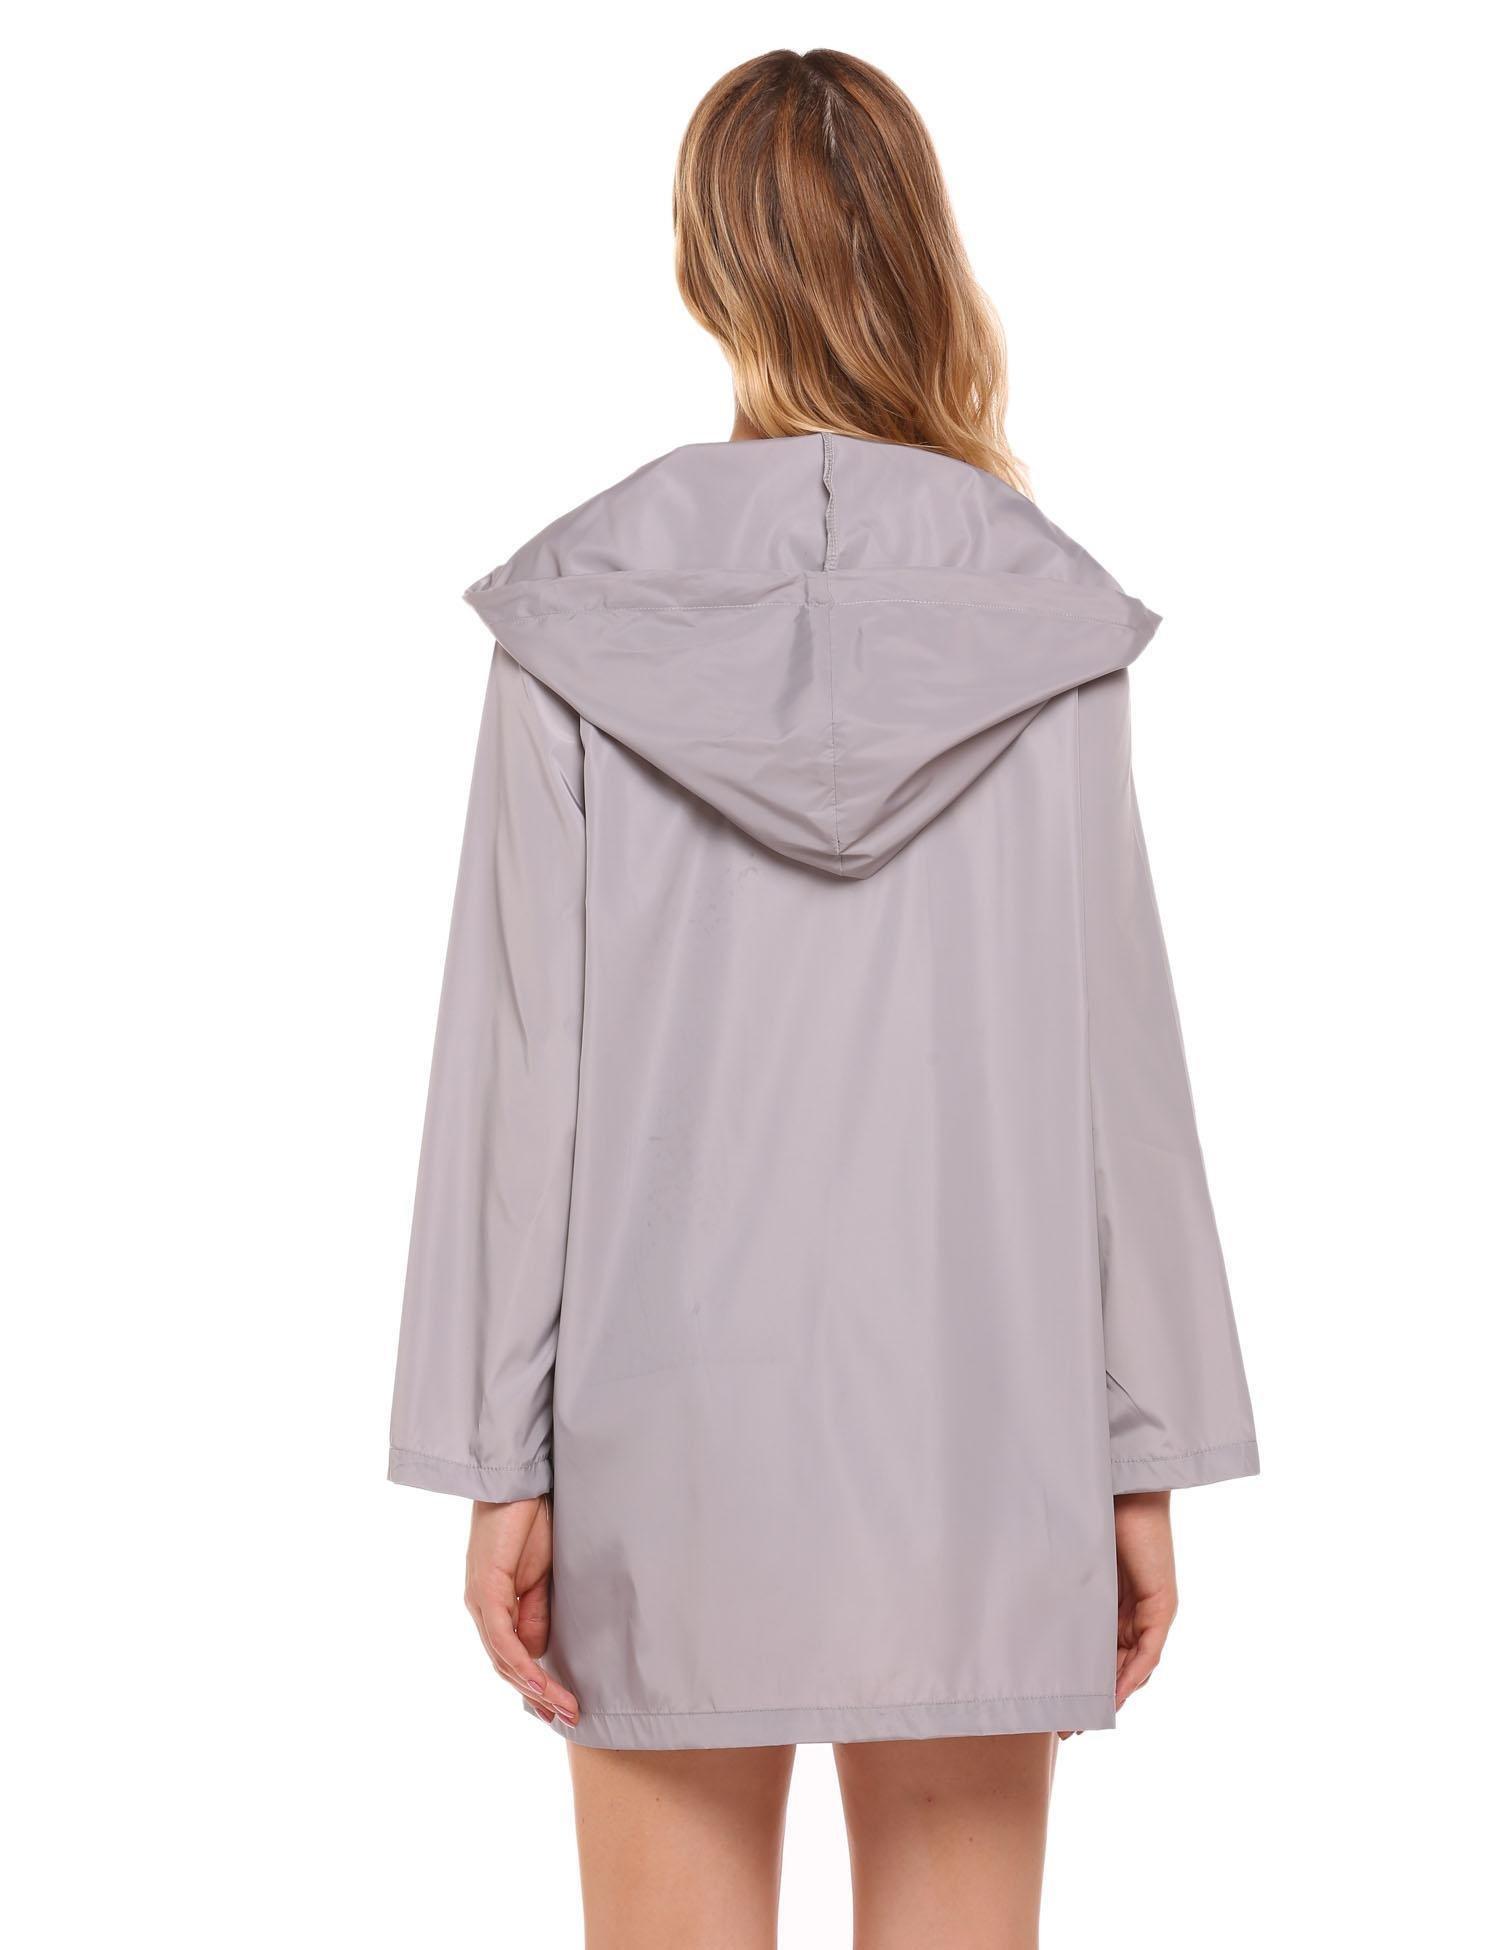 SoTeer Women's Raincoat Lightweight Grey Rain Jacket Long Sleeve Outdoor Waterproof Hooded Jacket Windbreaker Raincoats, Small by SoTeer